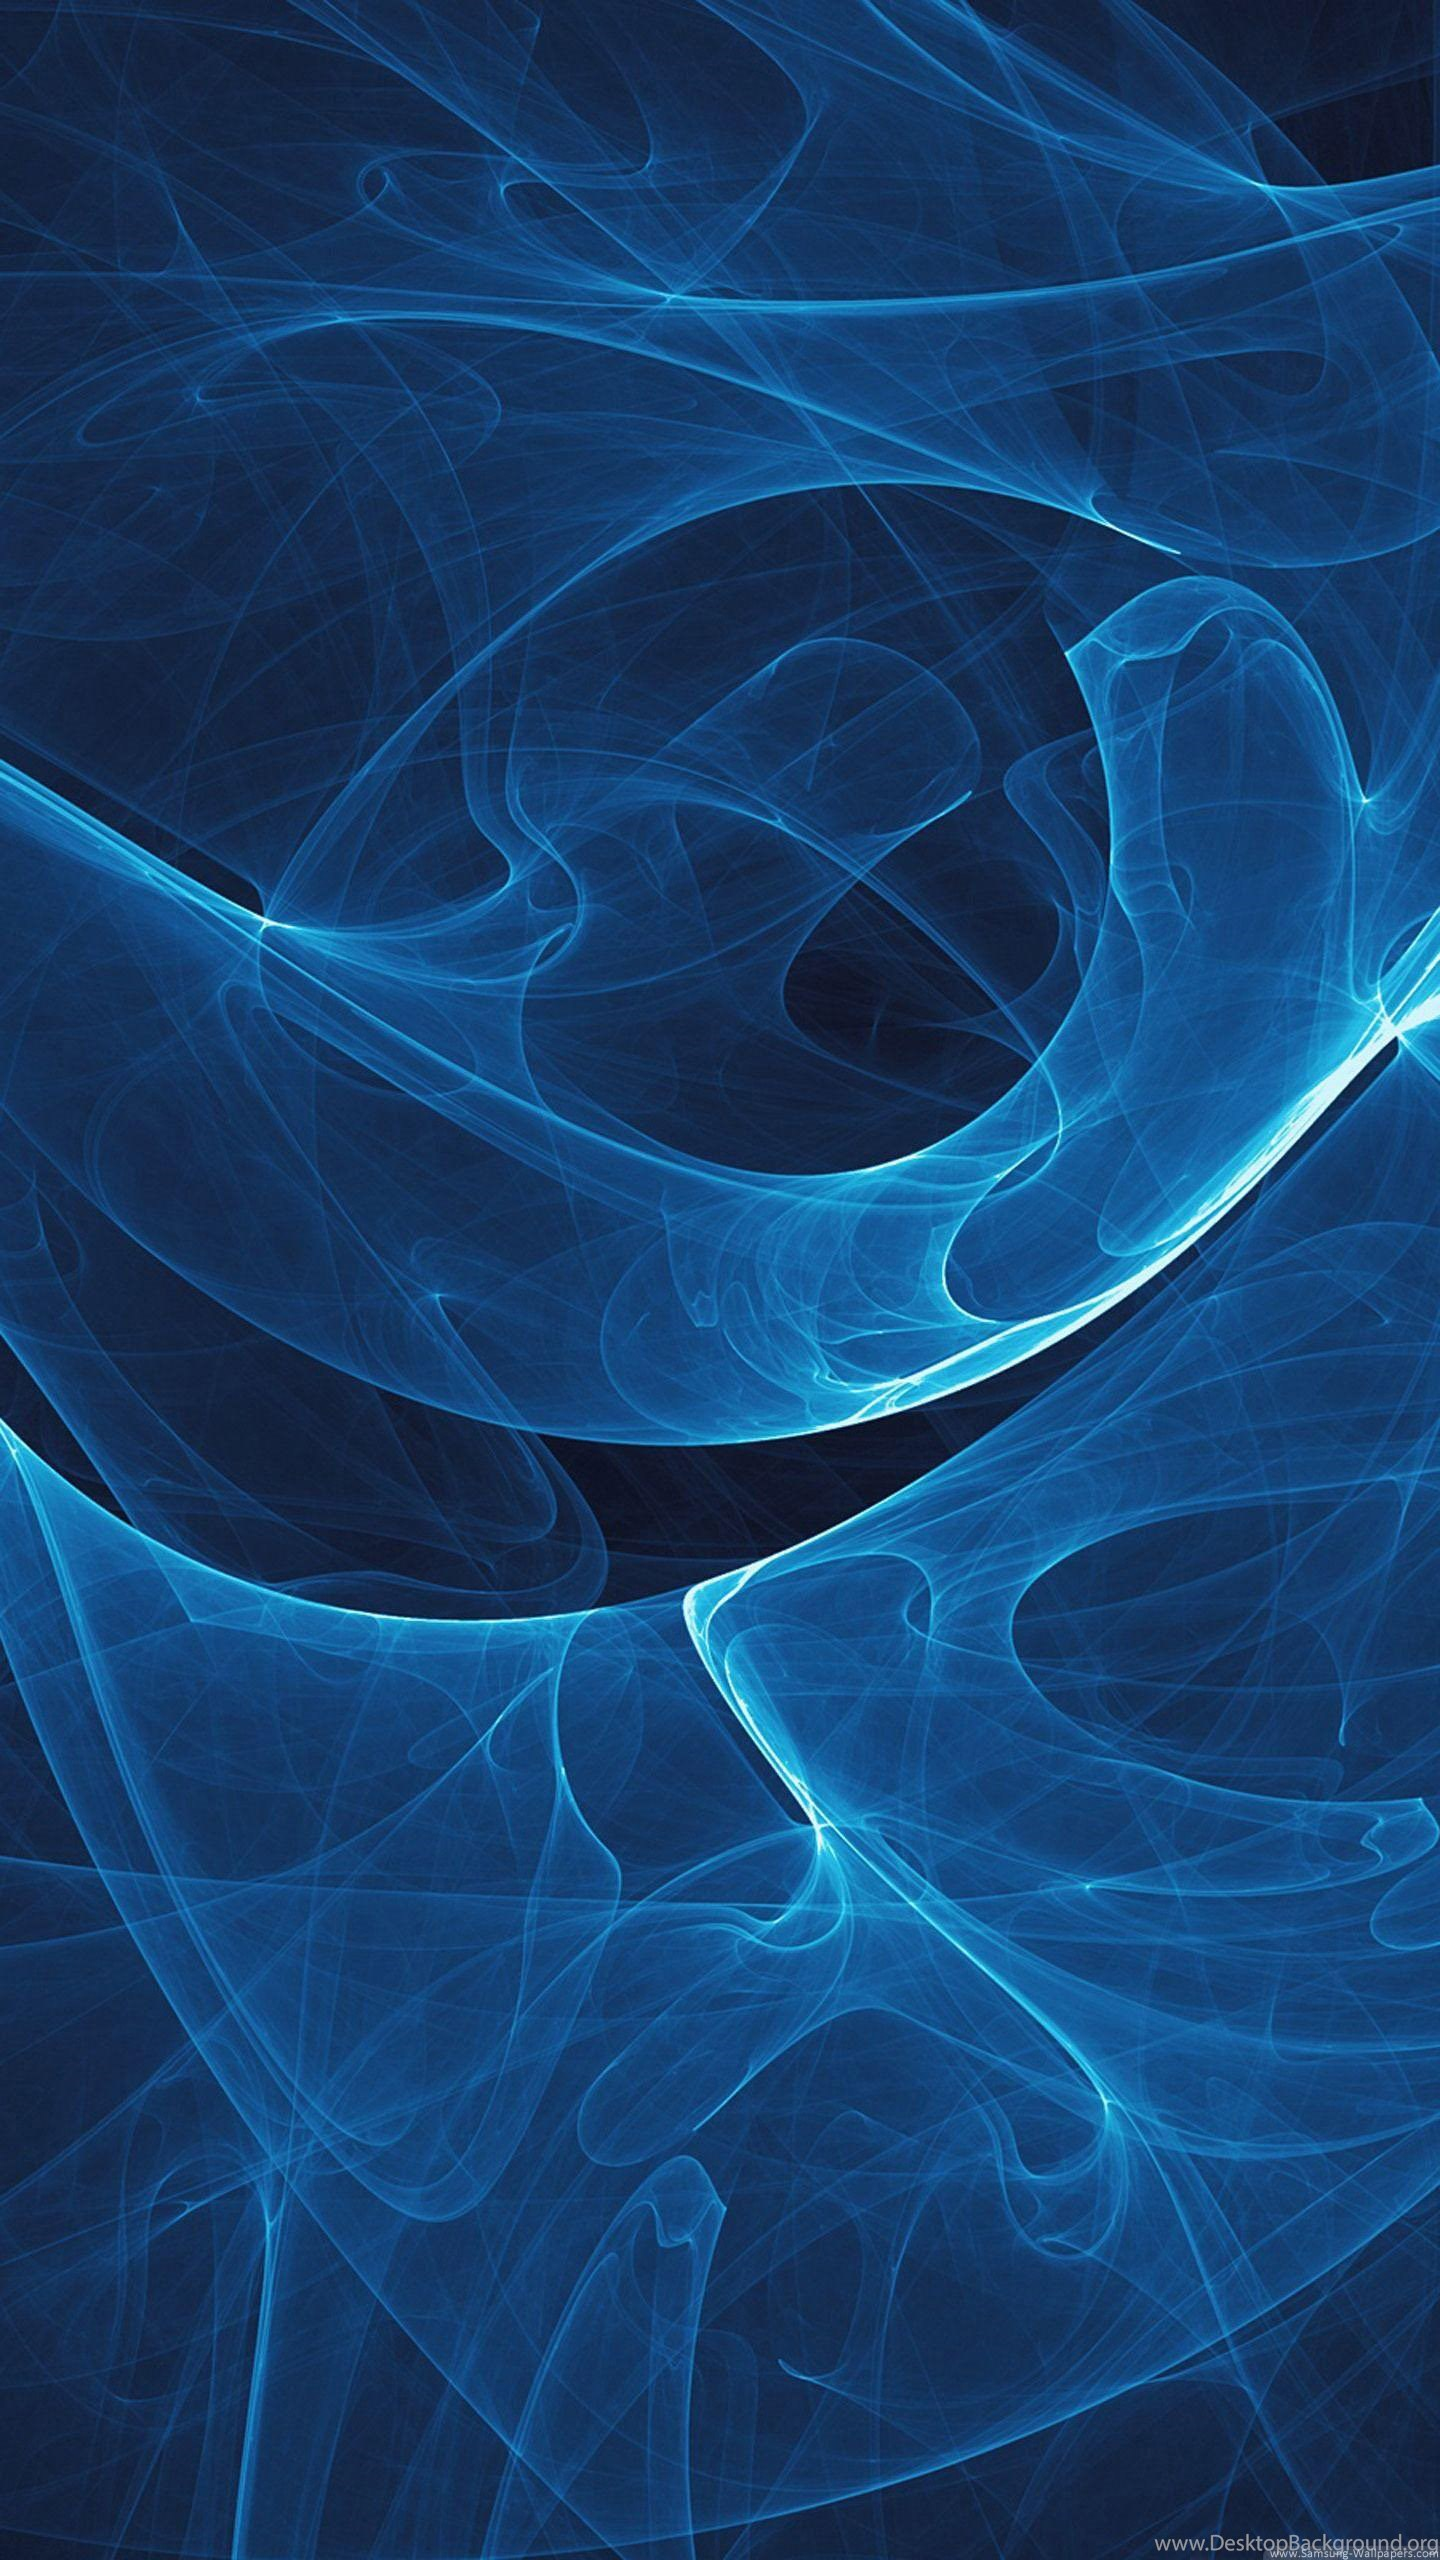 Abstract Blue Light Lock Screen 1440x2560 Samsung Galaxy S5 Desktop Background